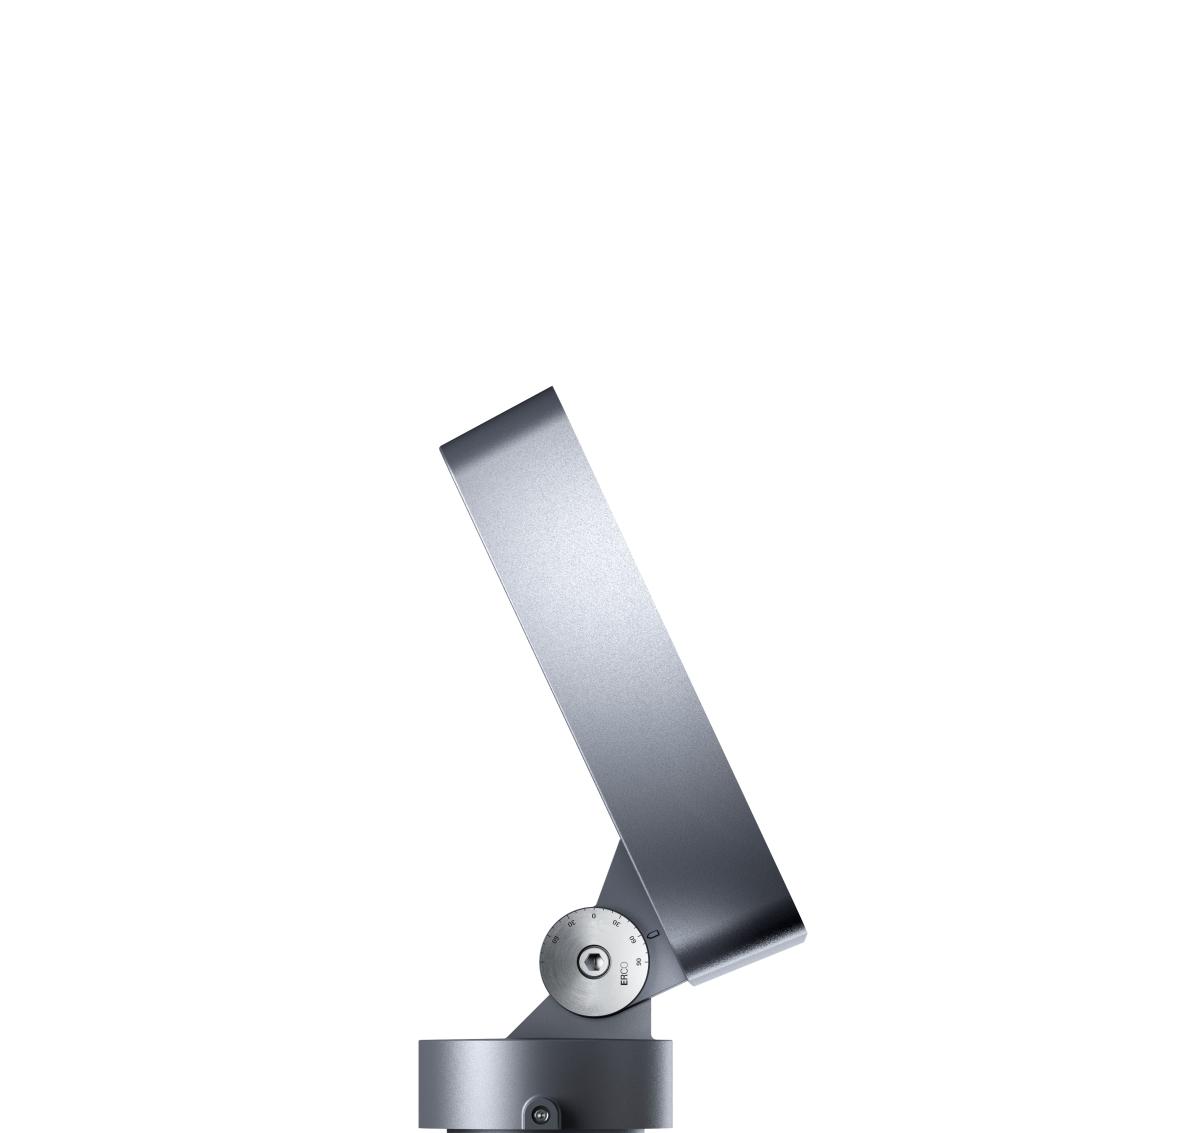 Erco lightscan design eur 03